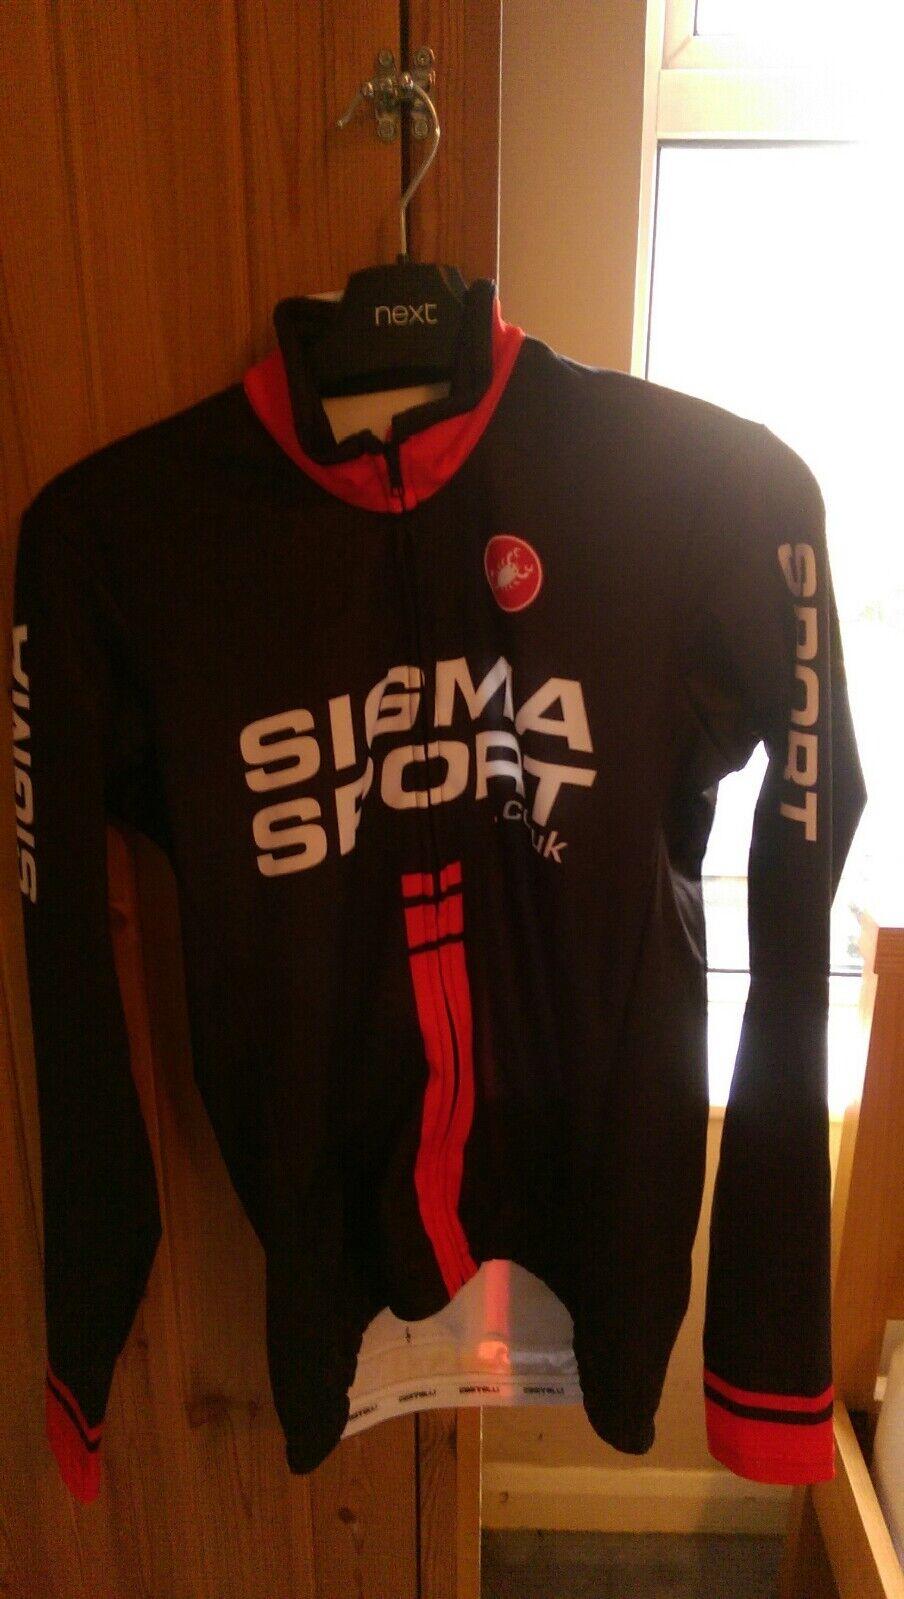 Castelli Sigma Sport Thermal Long Sleeve Jersey